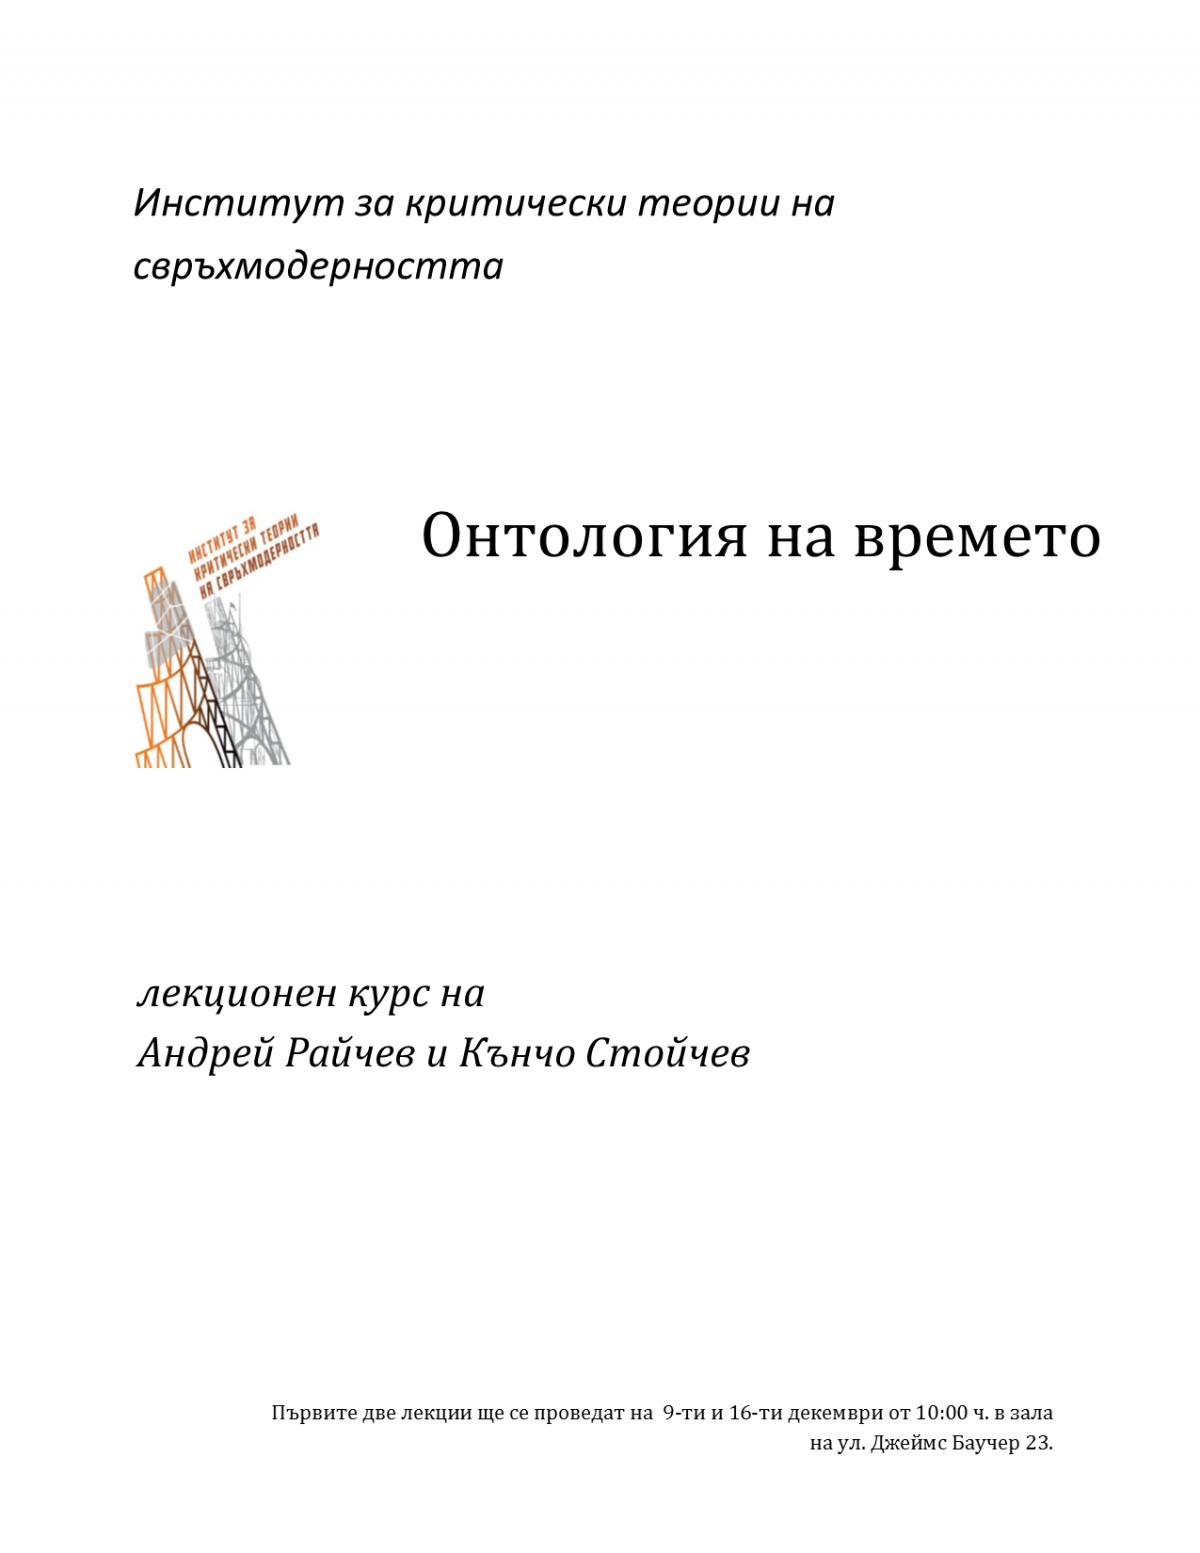 Андрей Райчев, Кънчо Стойчев: Онтология на времето (лекционен курс)